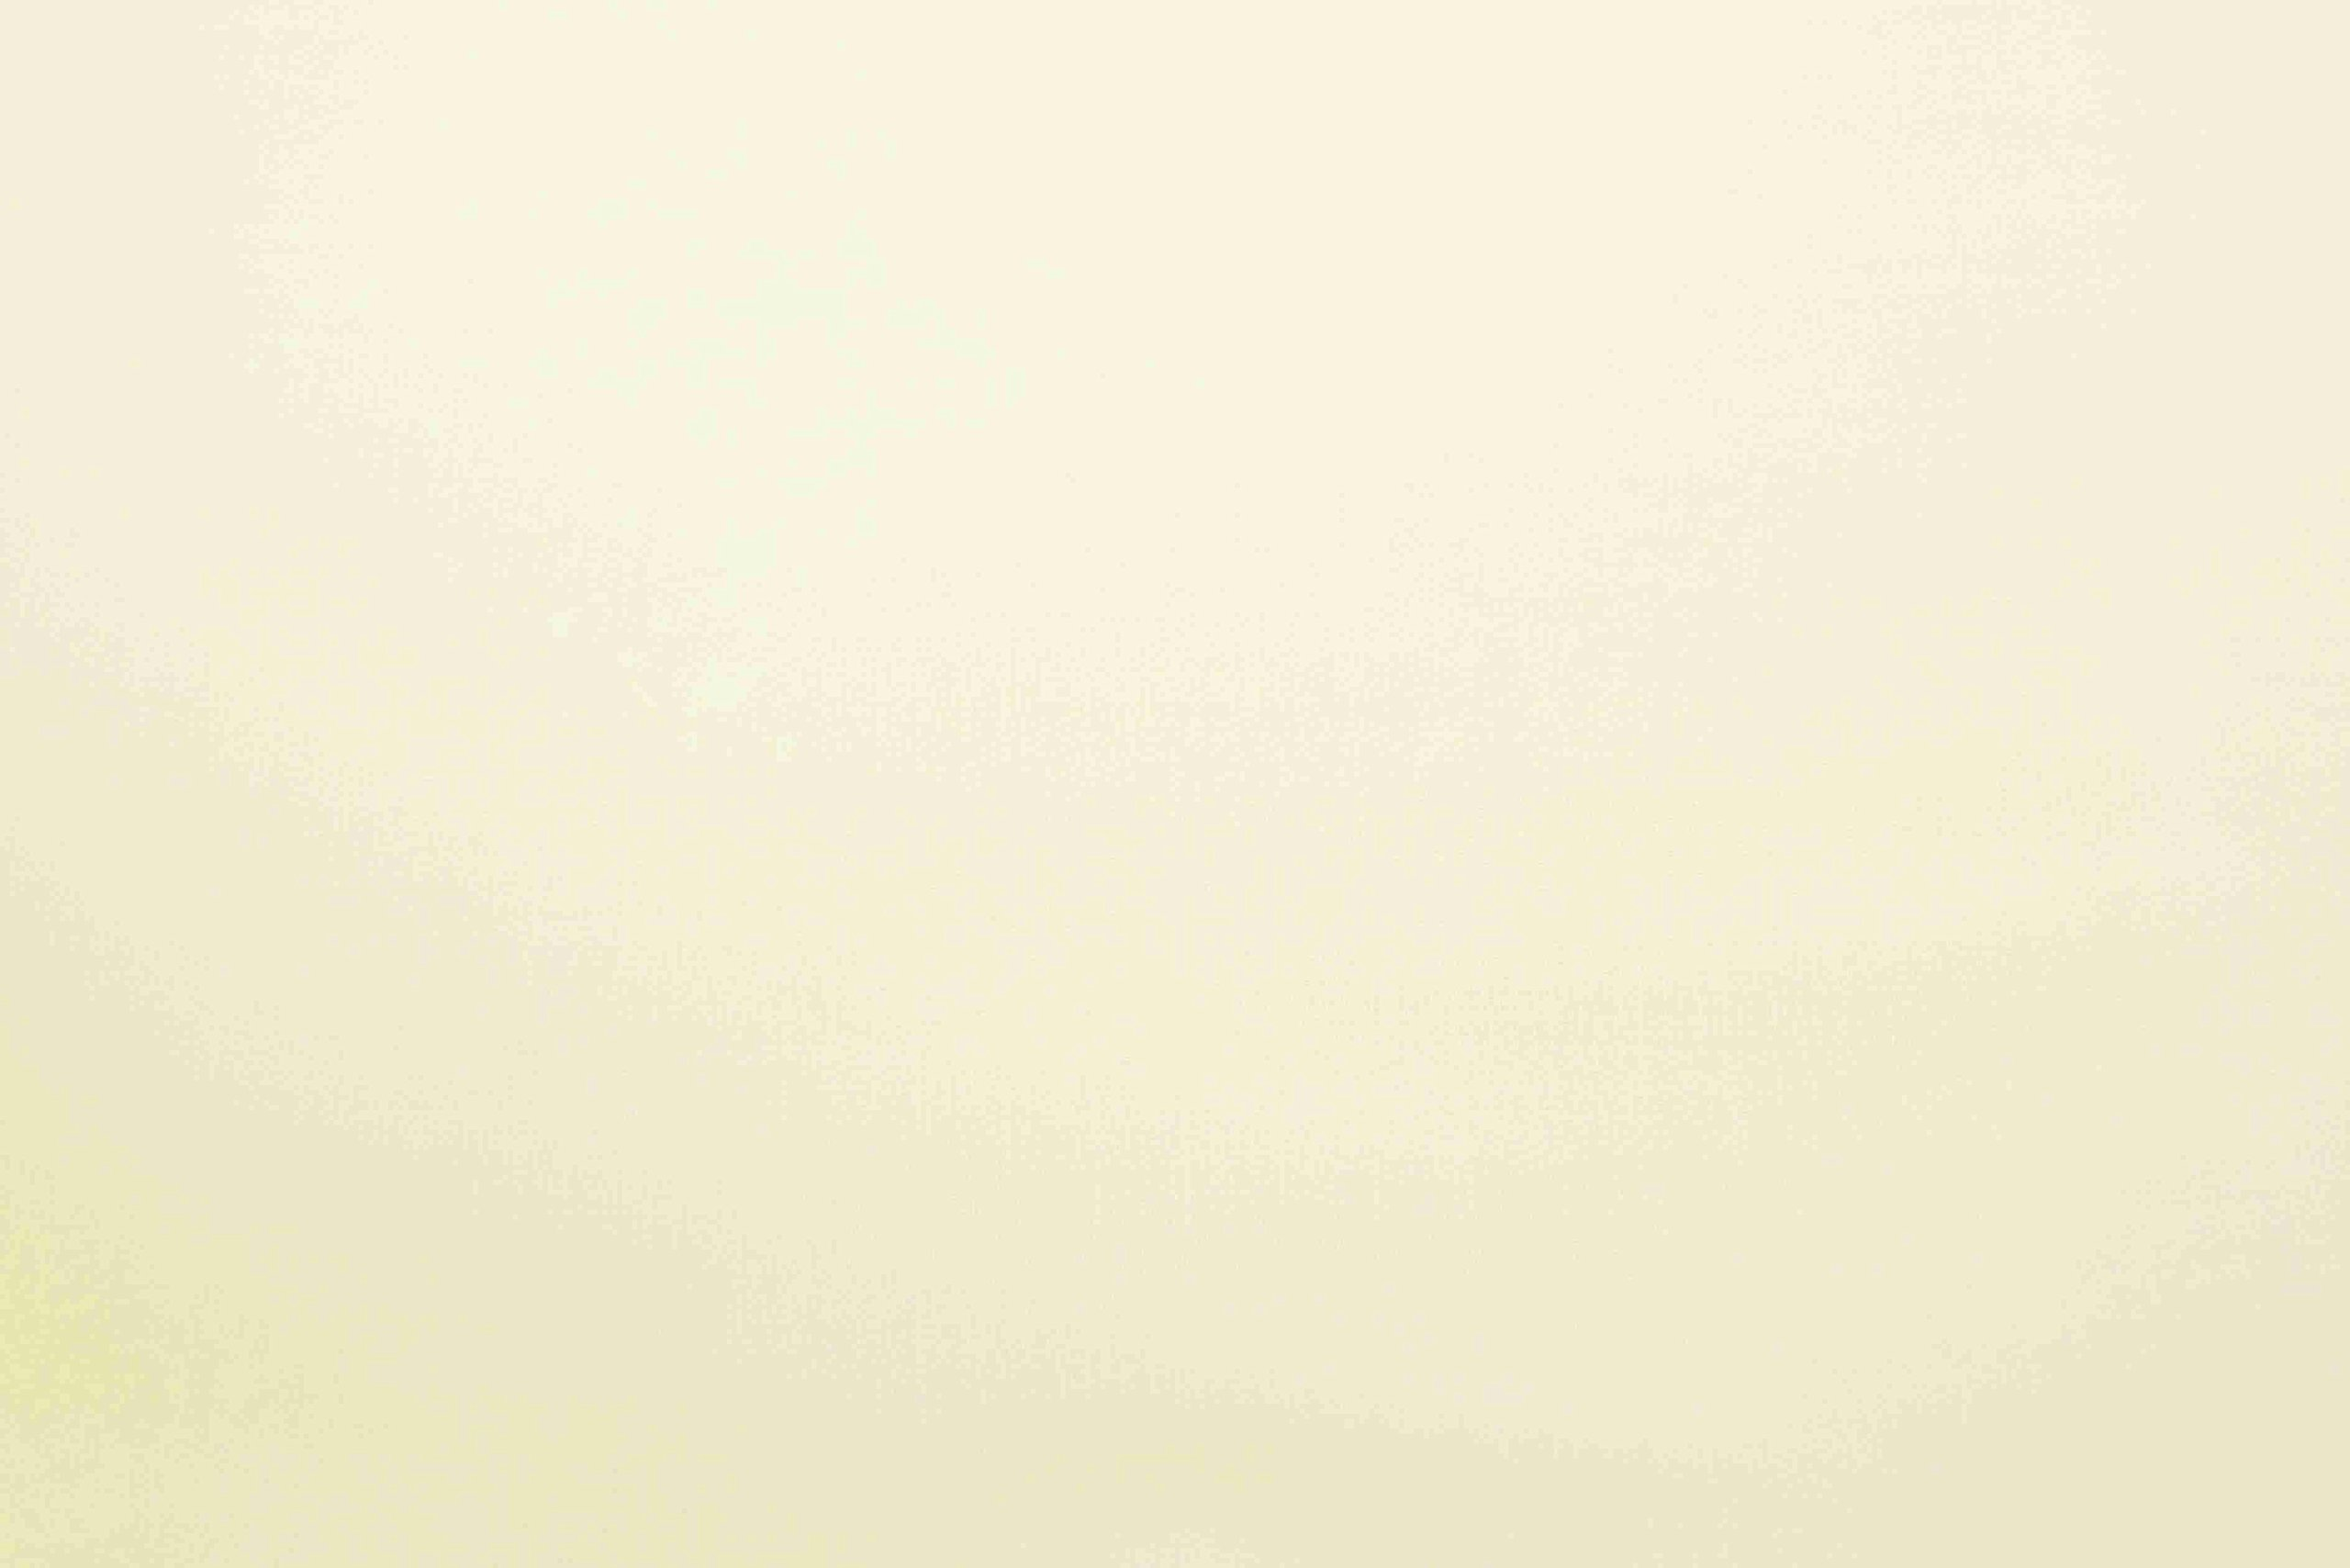 Fine Cashmere Stole Karakoram Birds-Eye Weave Forget Me Not by Pashmina & Silk by Pashmina & Silk (Image #3)